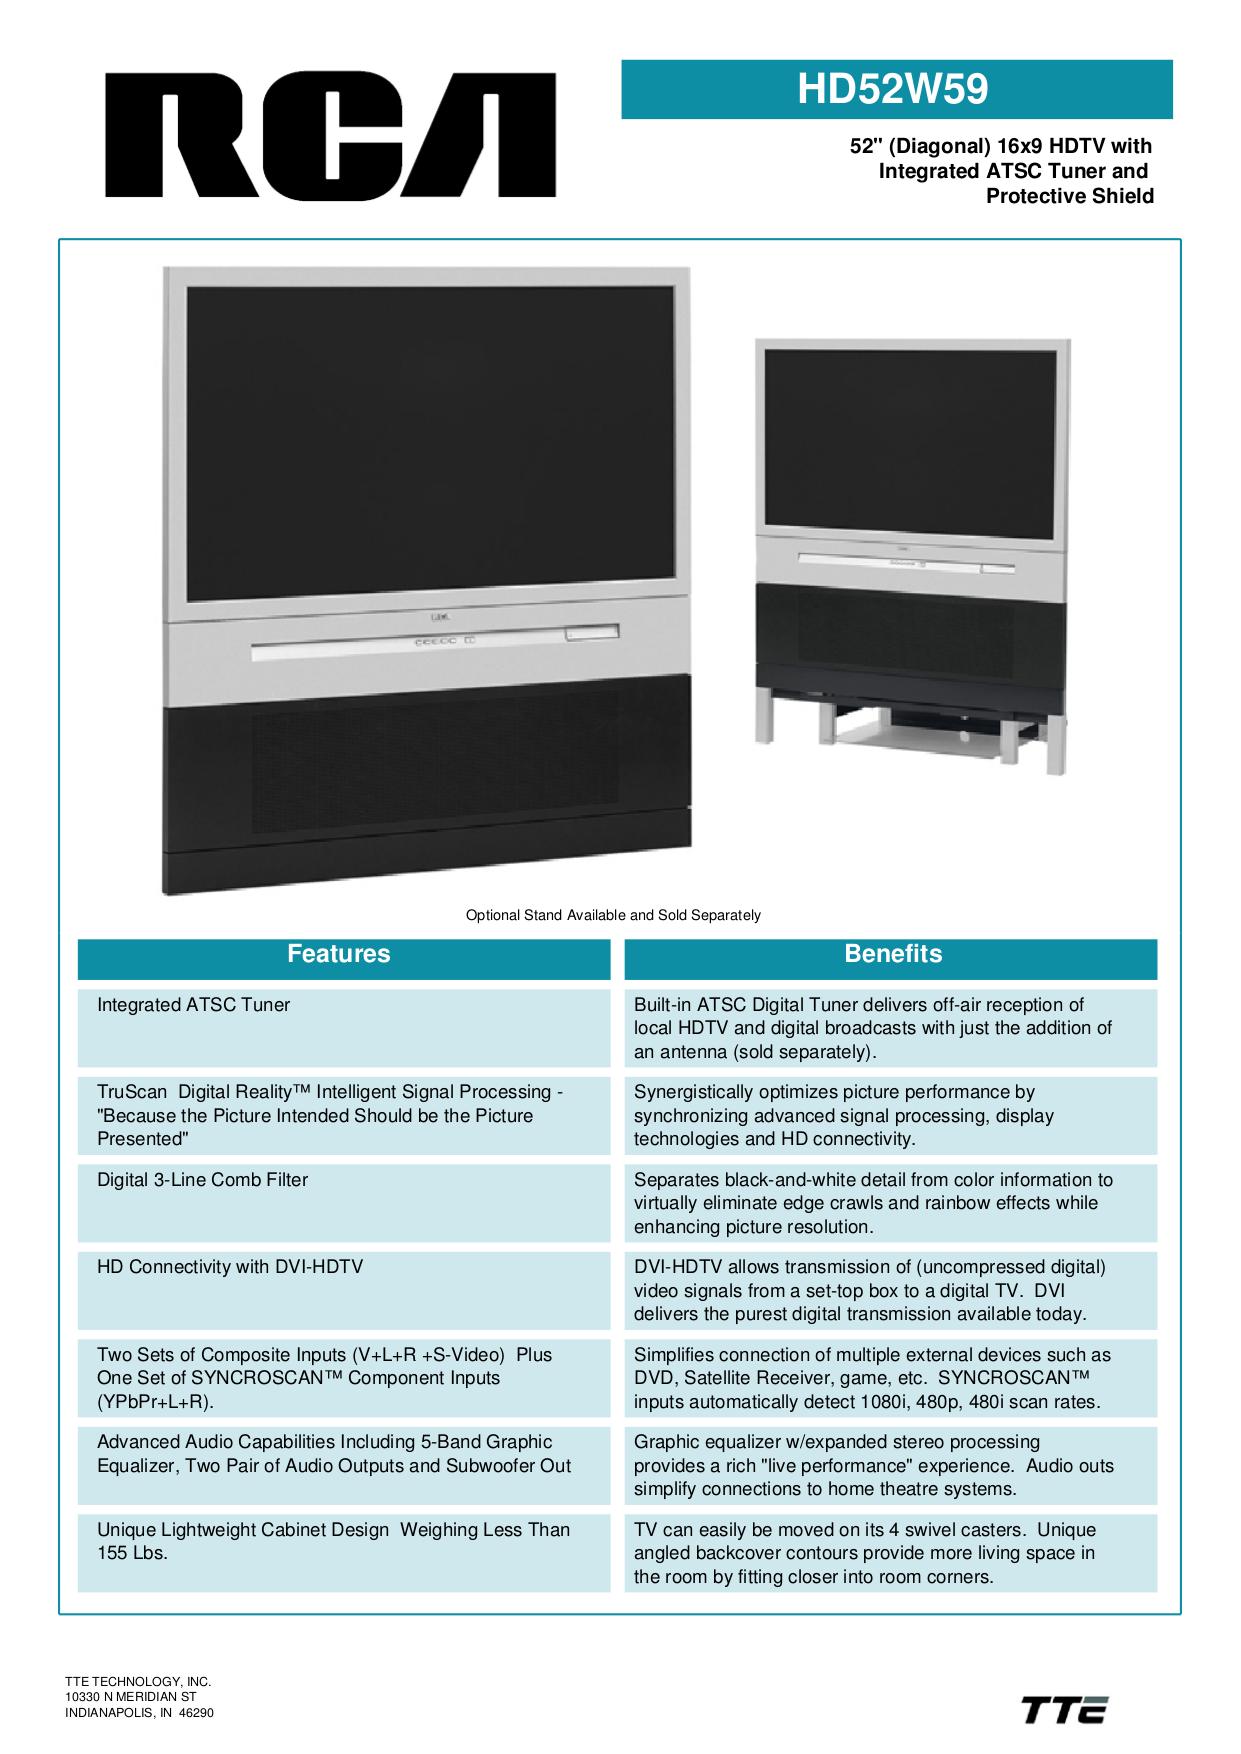 Download free pdf for RCA HD52W59 TV manual